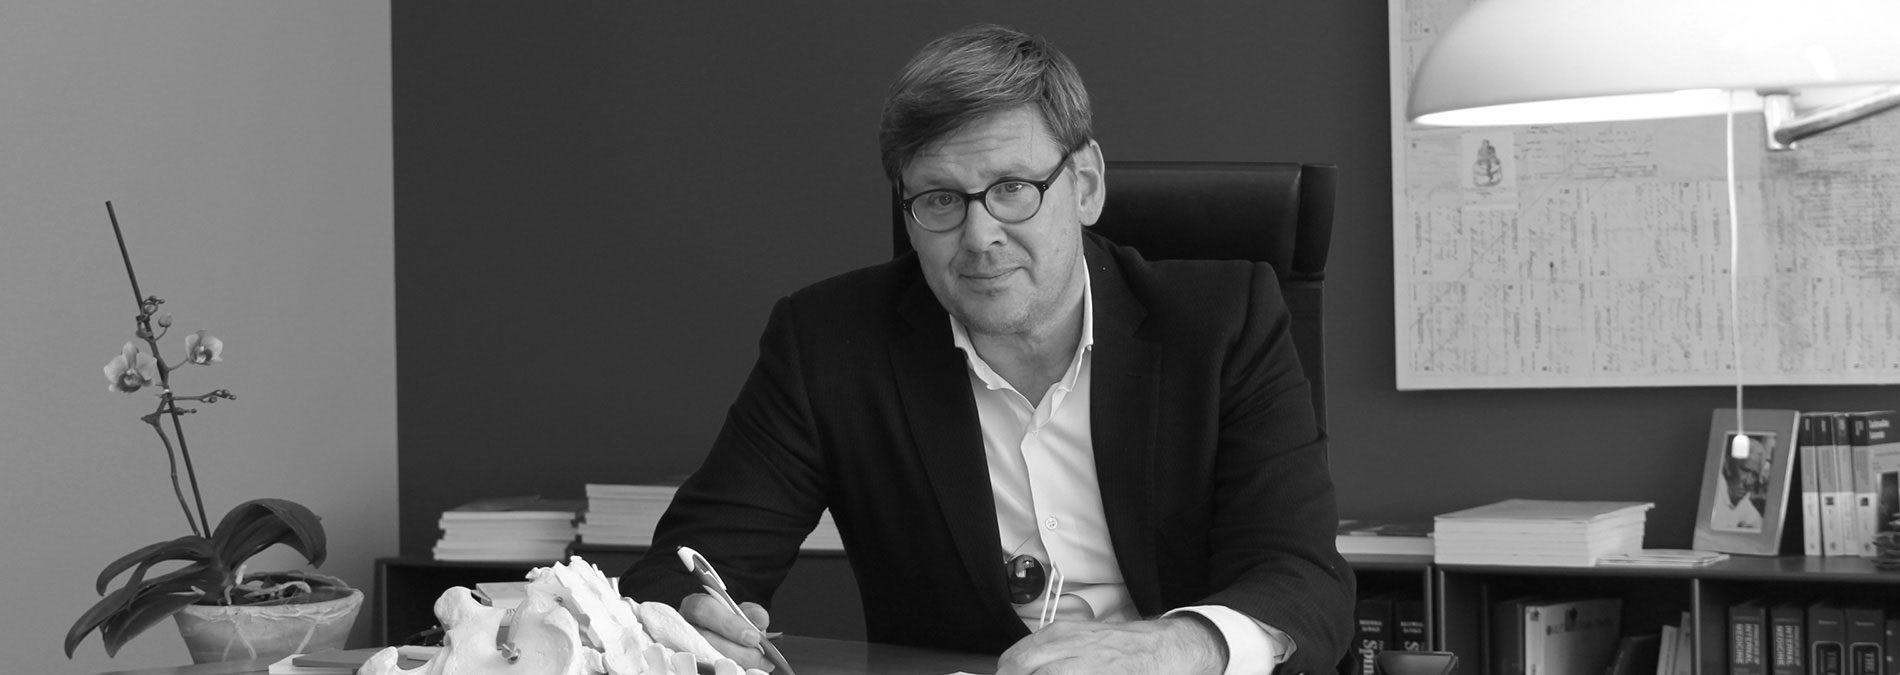 Dr. med. Walter Morgenstern